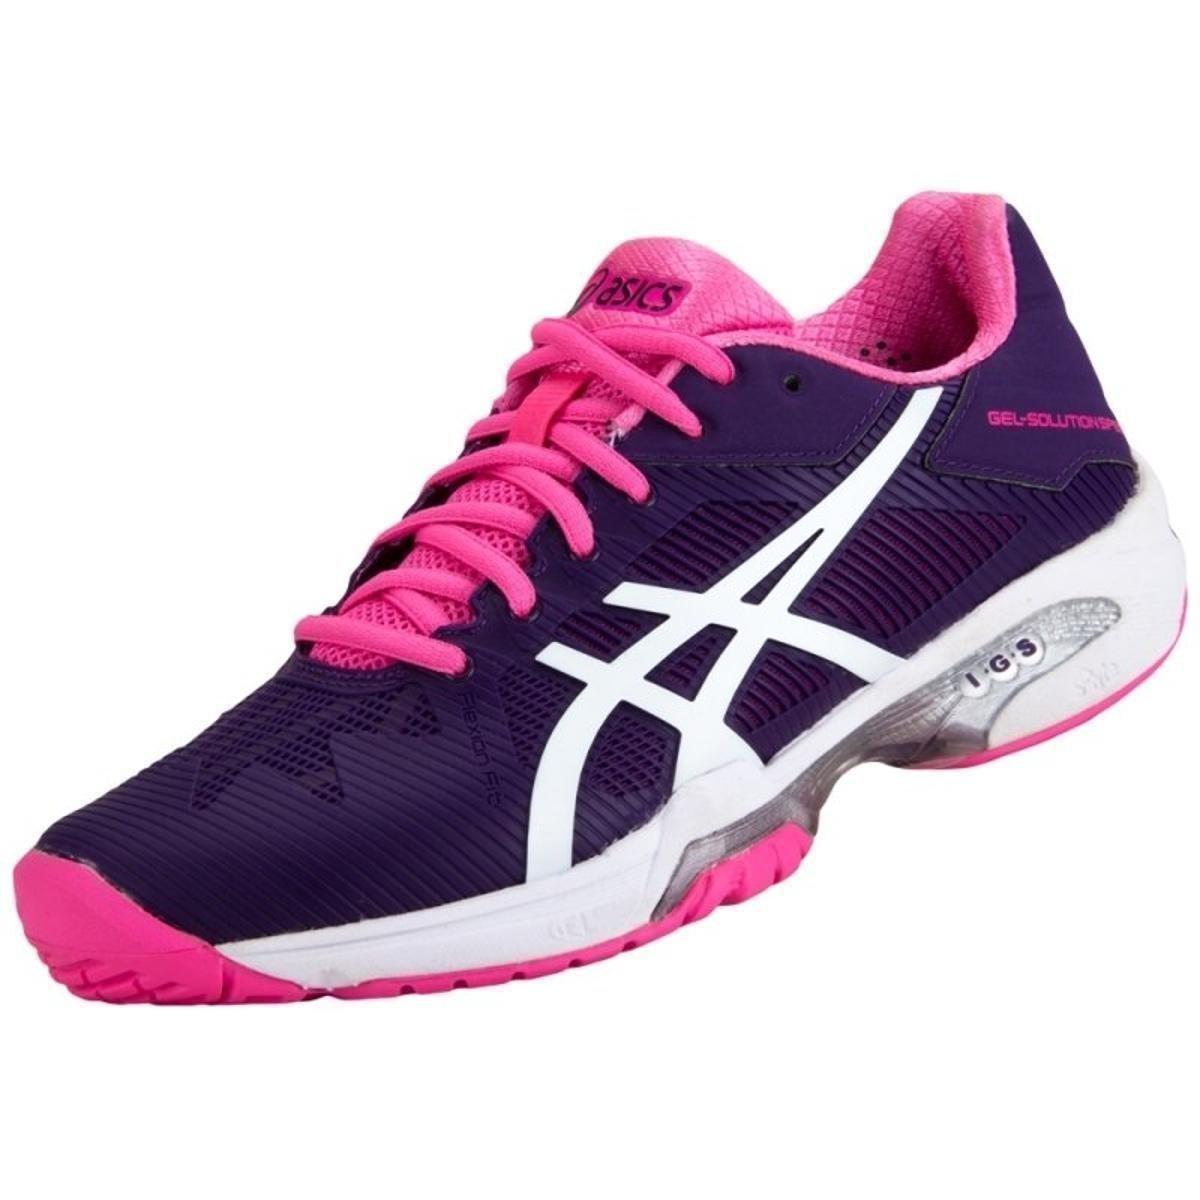 tenis asics rosa roxo